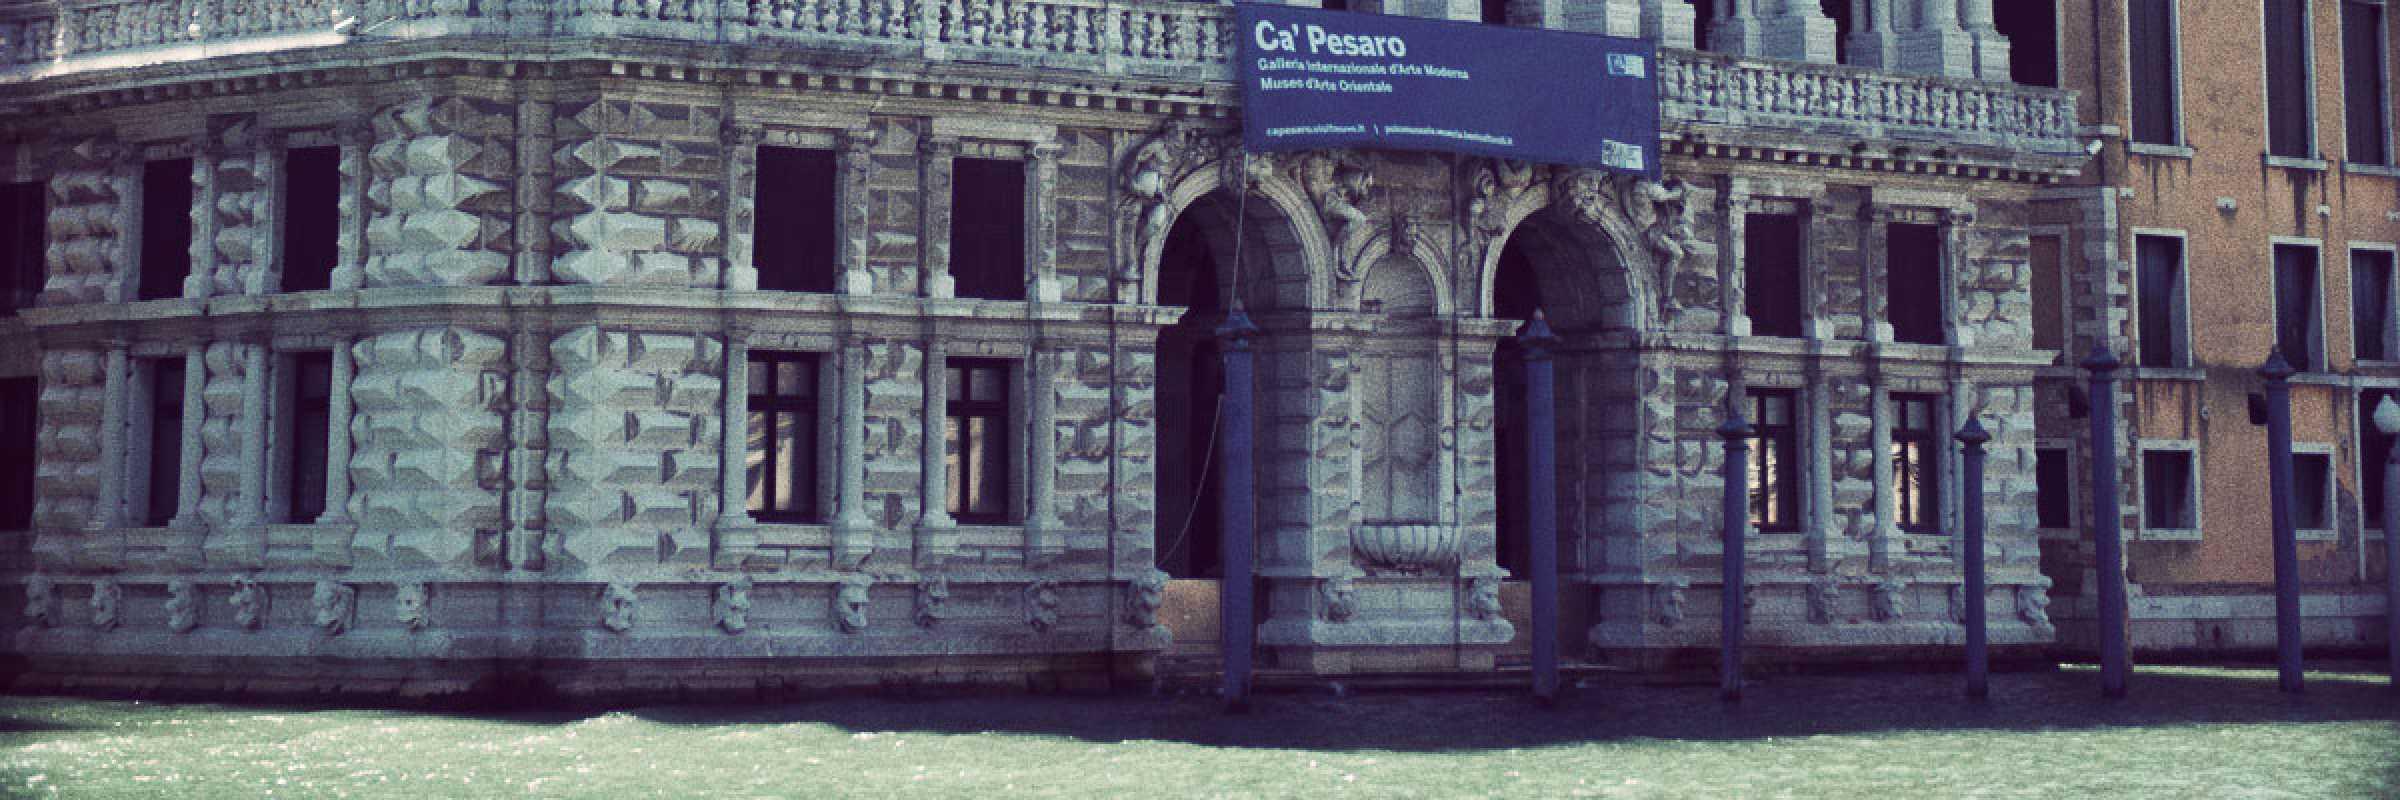 Cà Pesaro.